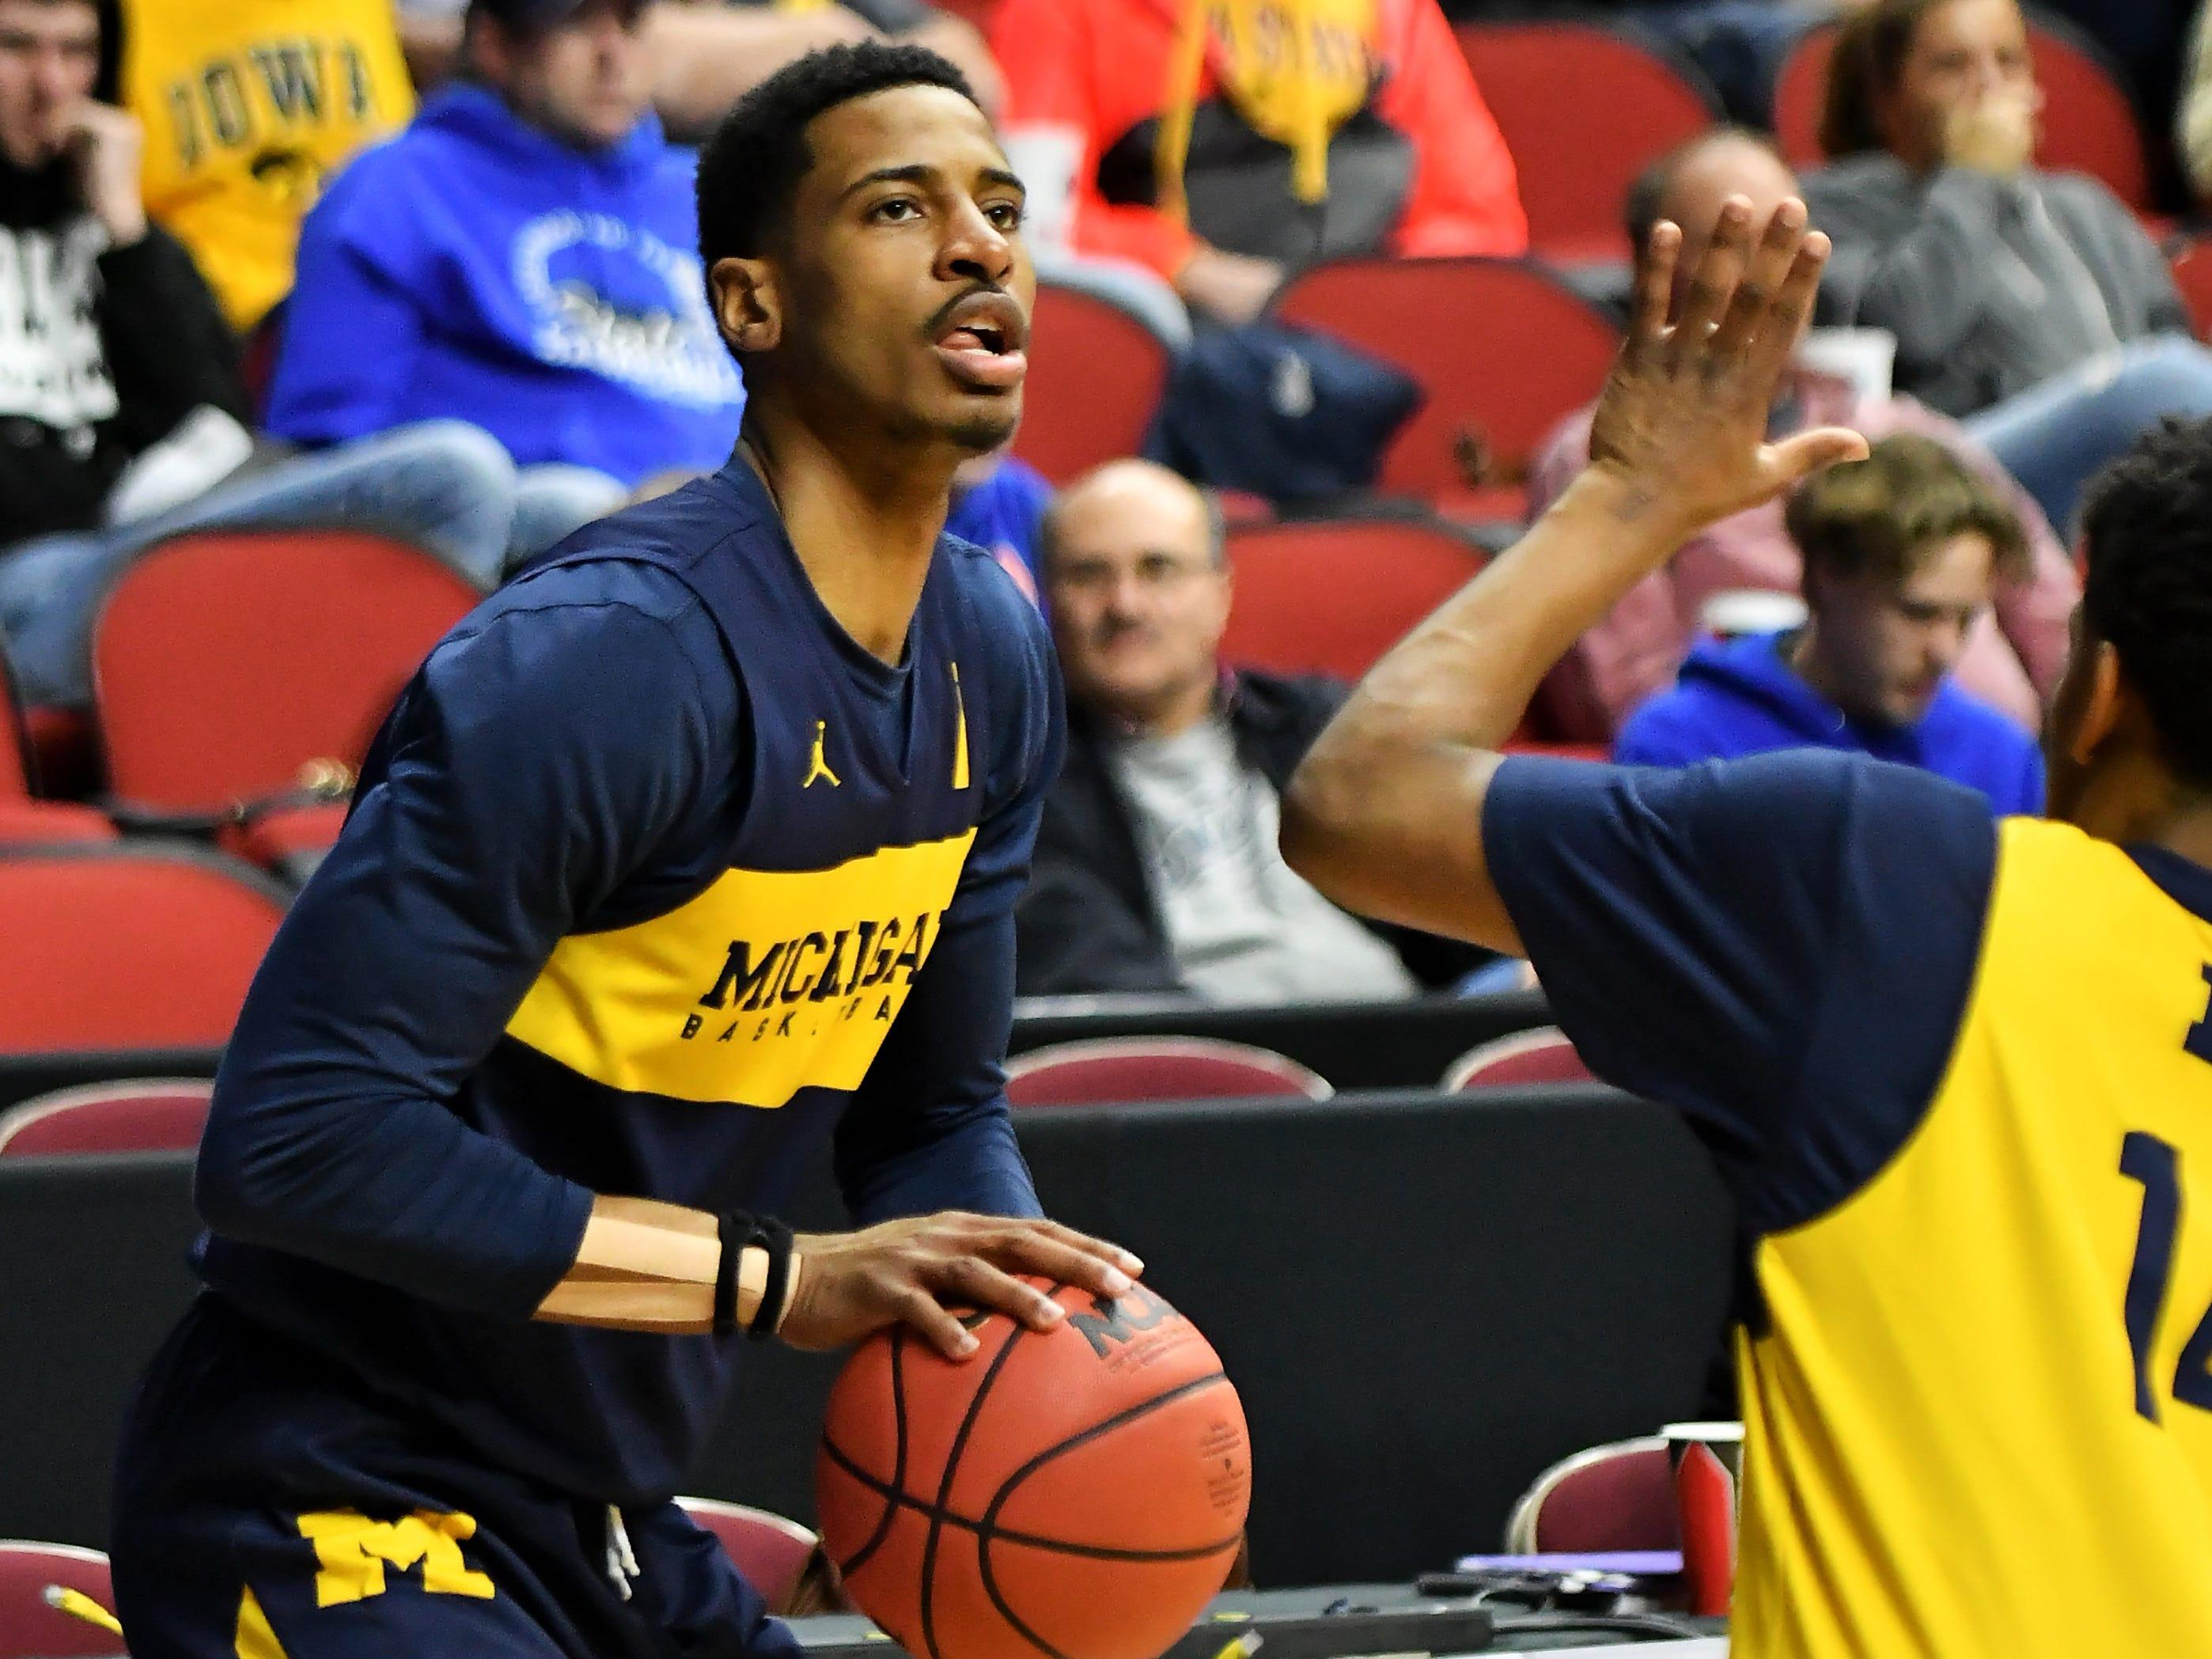 Michigan guard Charles Matthews shoots around at practice.